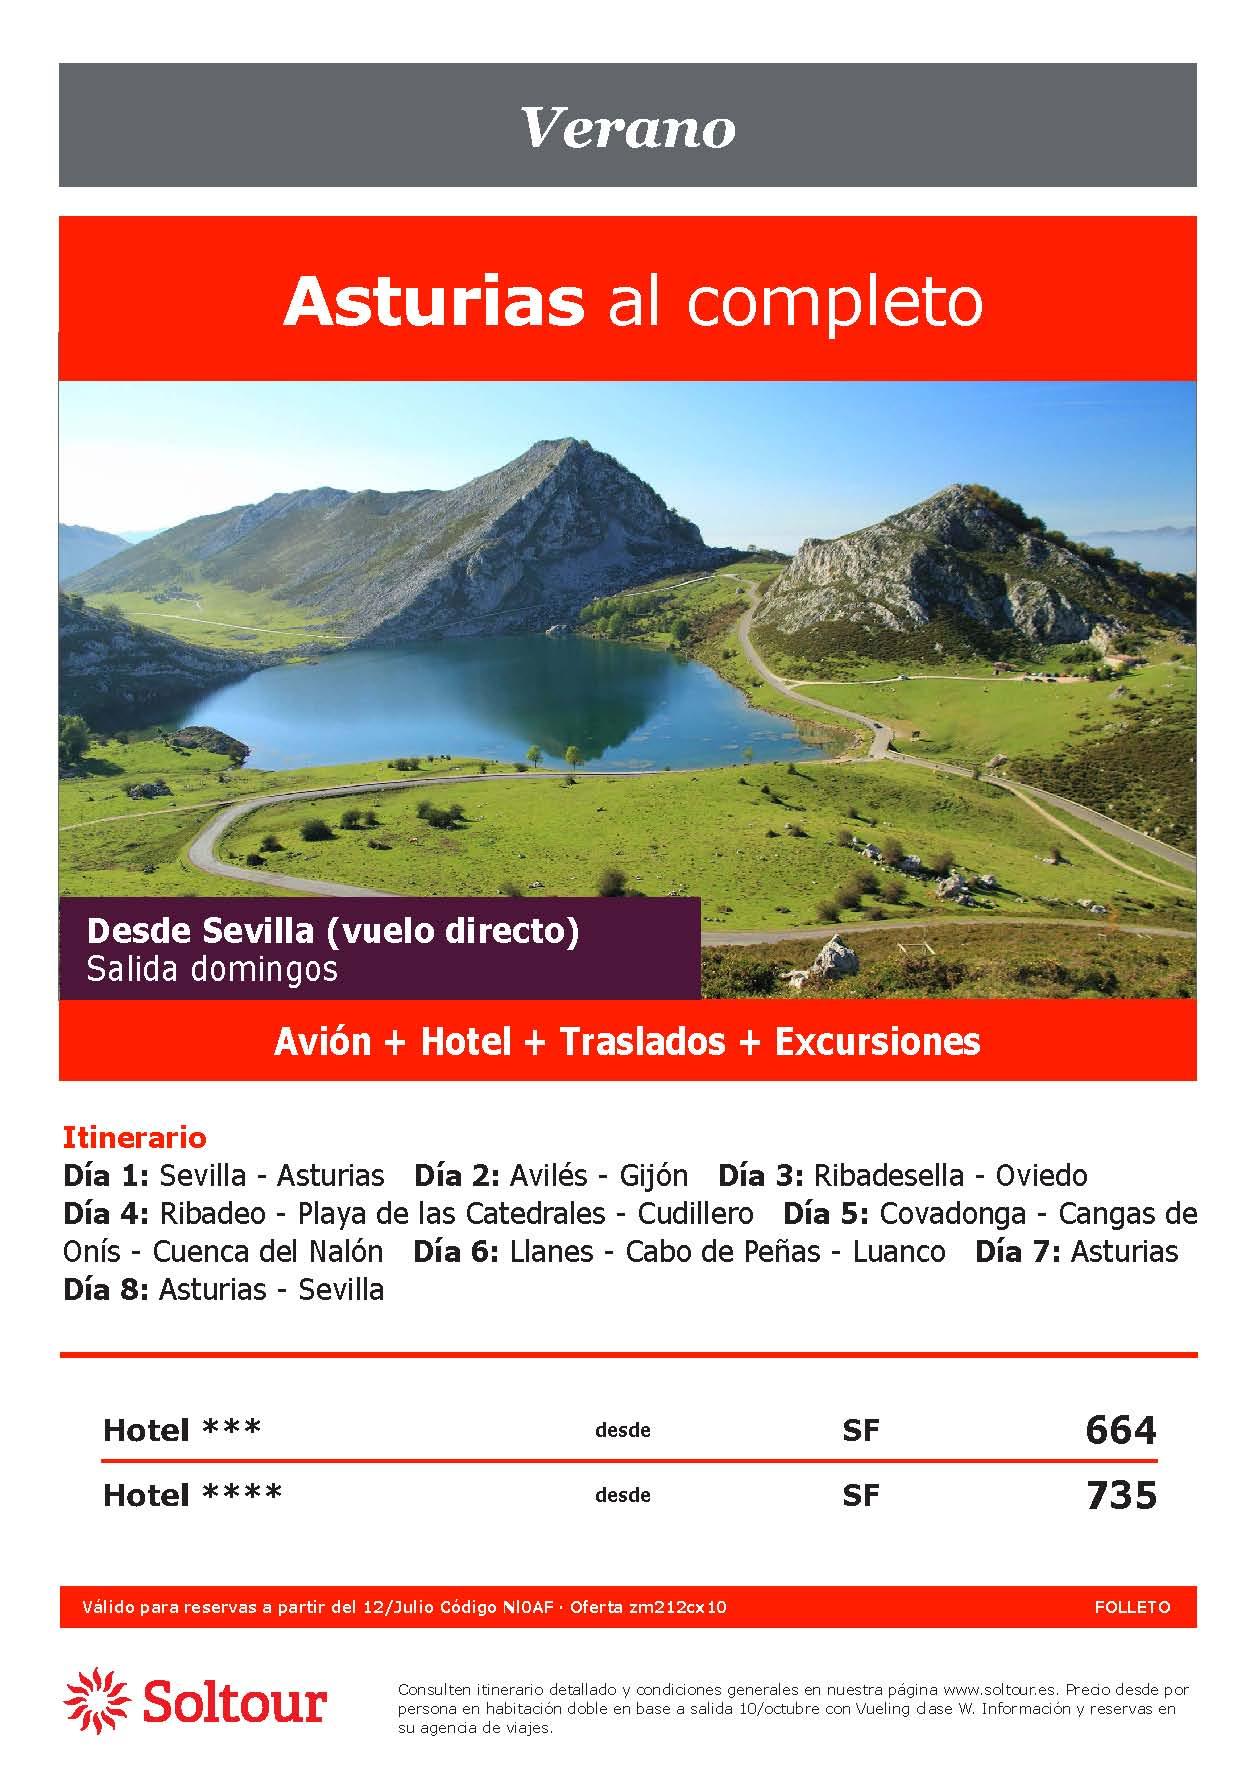 Oferta Soltour Ultima Hora Circuito en avion Asturias desde Sevilla Verano 2021